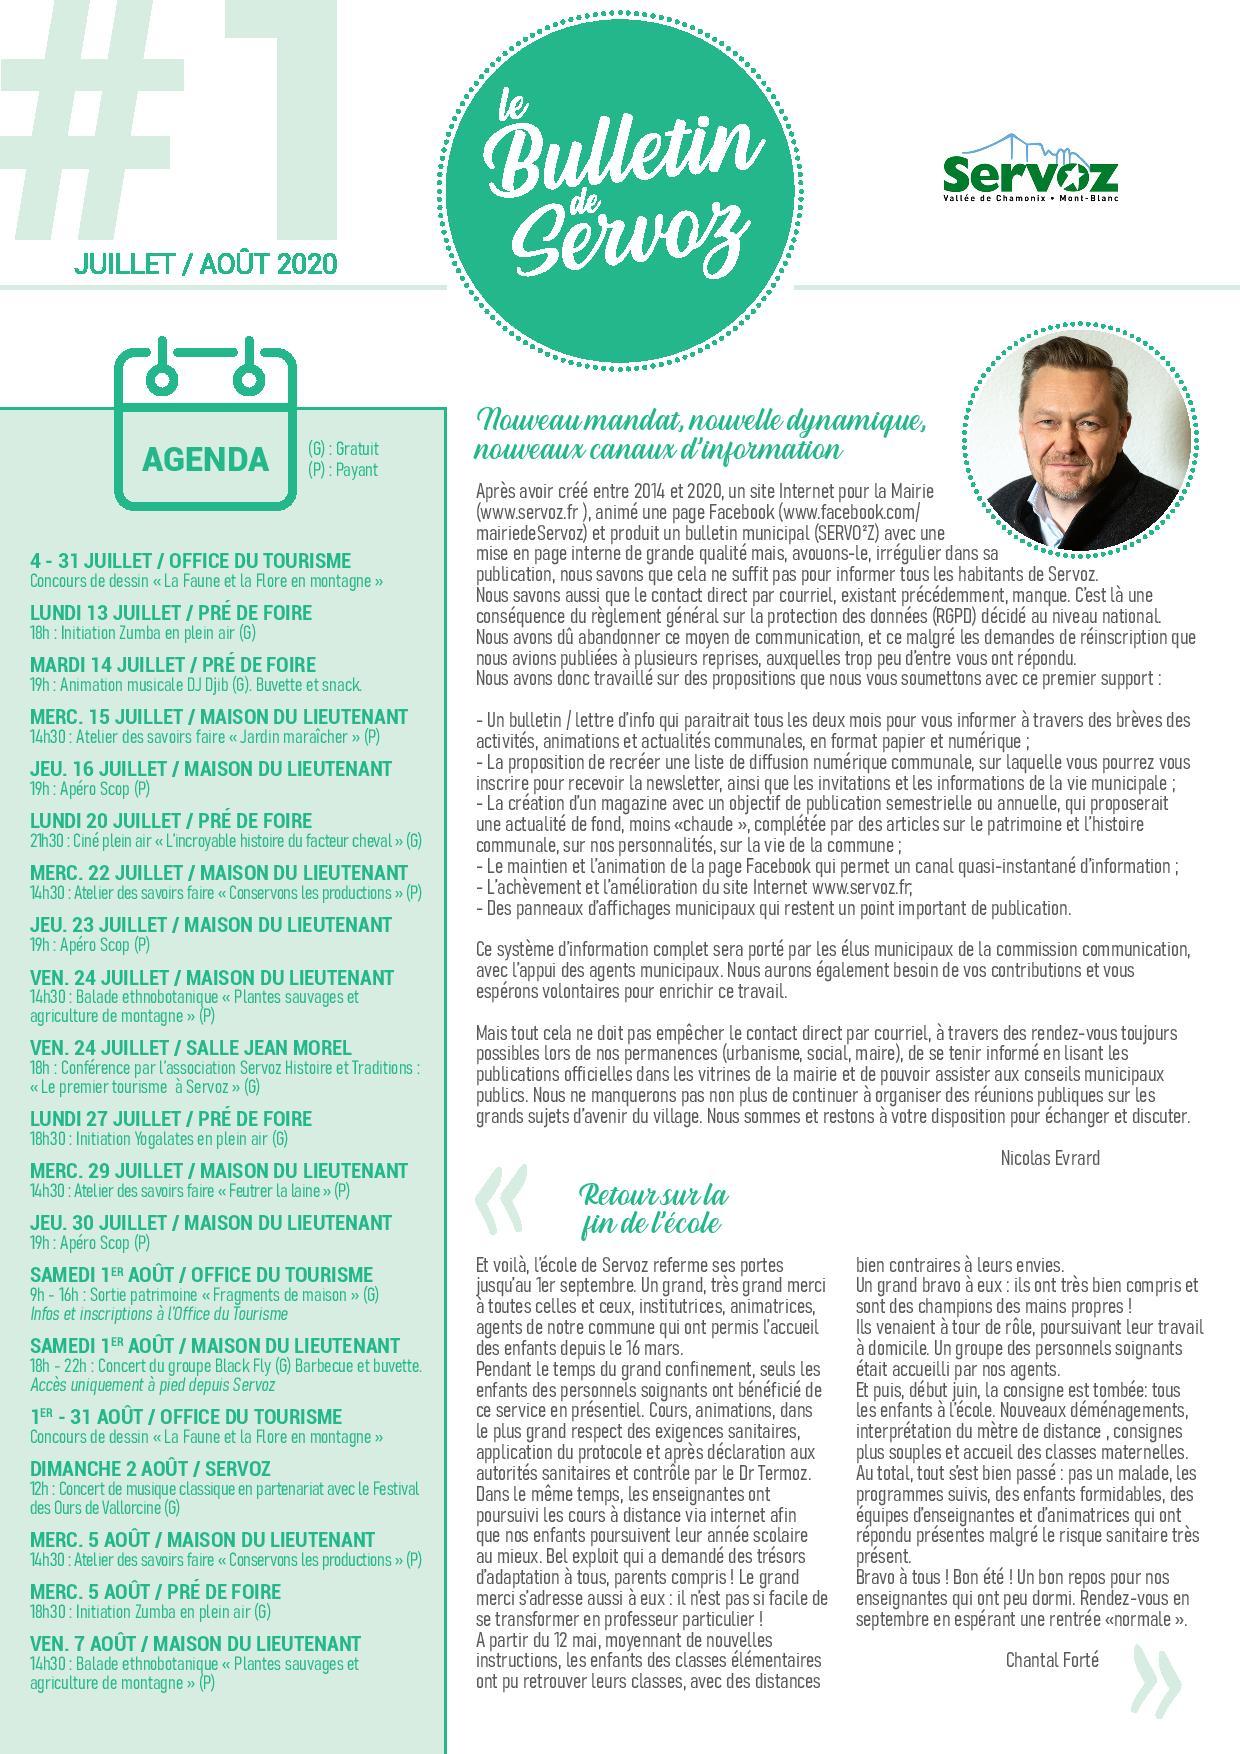 Bulletin de Servoz - Juillet / Août 2020